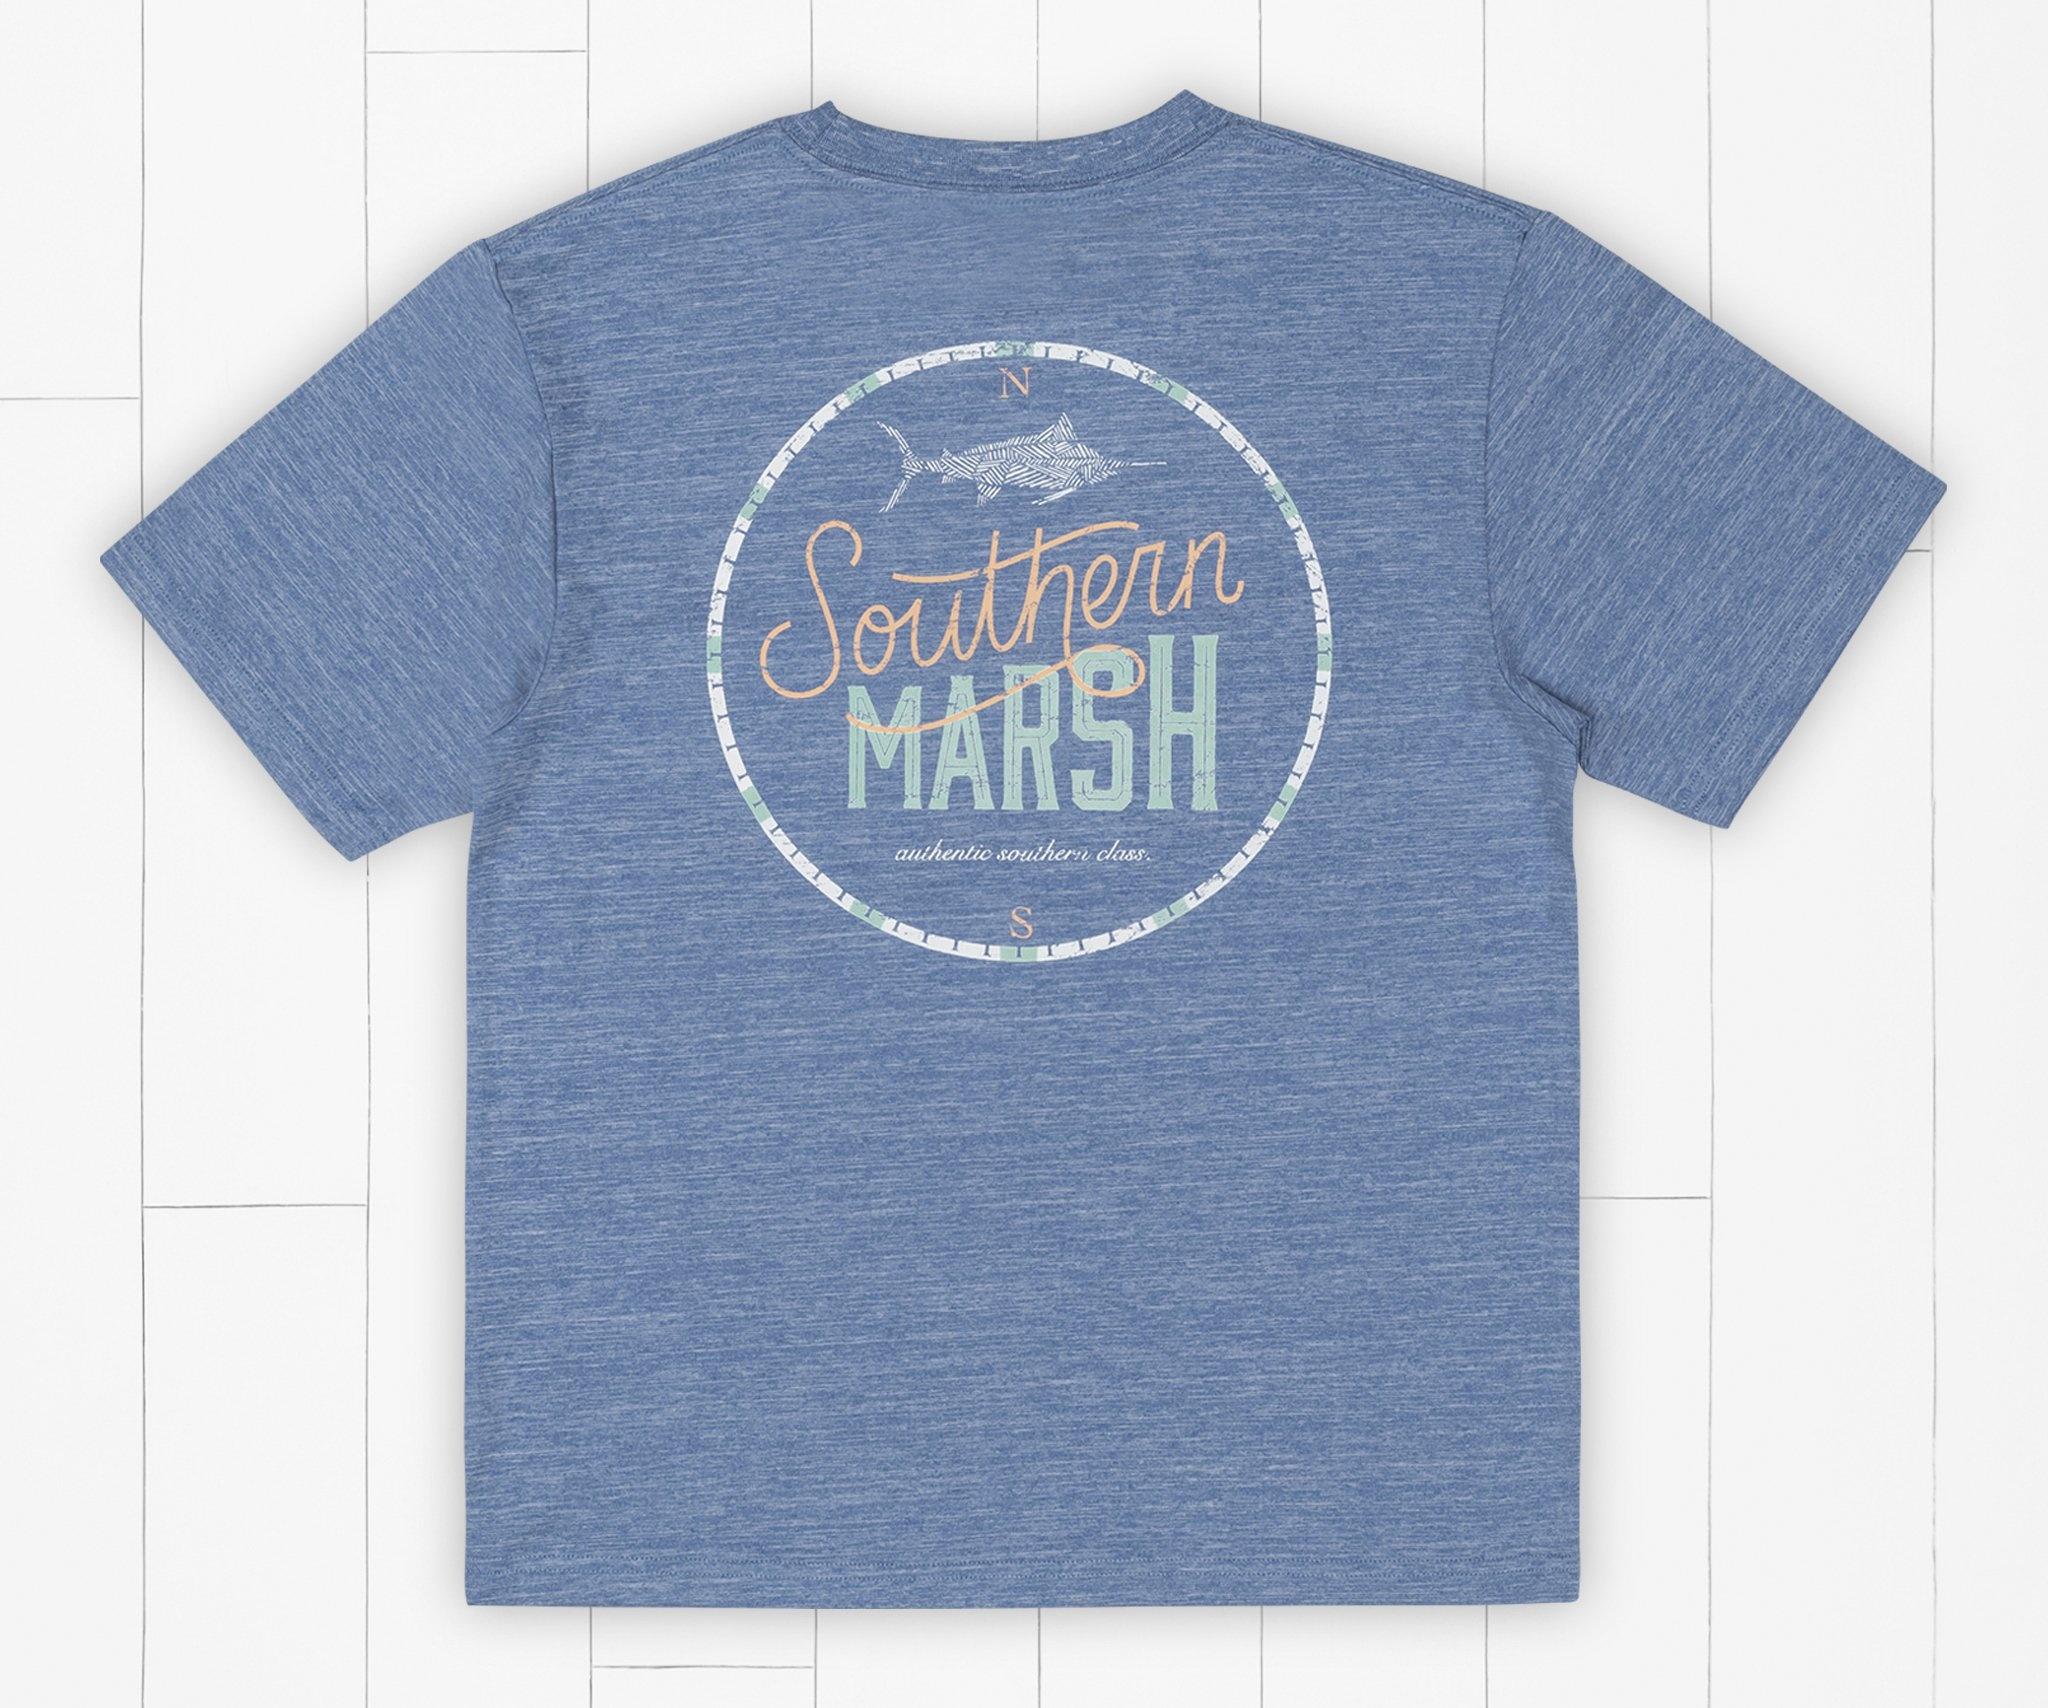 Southern Marsh Youth FieldTec™ Heathered Tee - Marlin Time